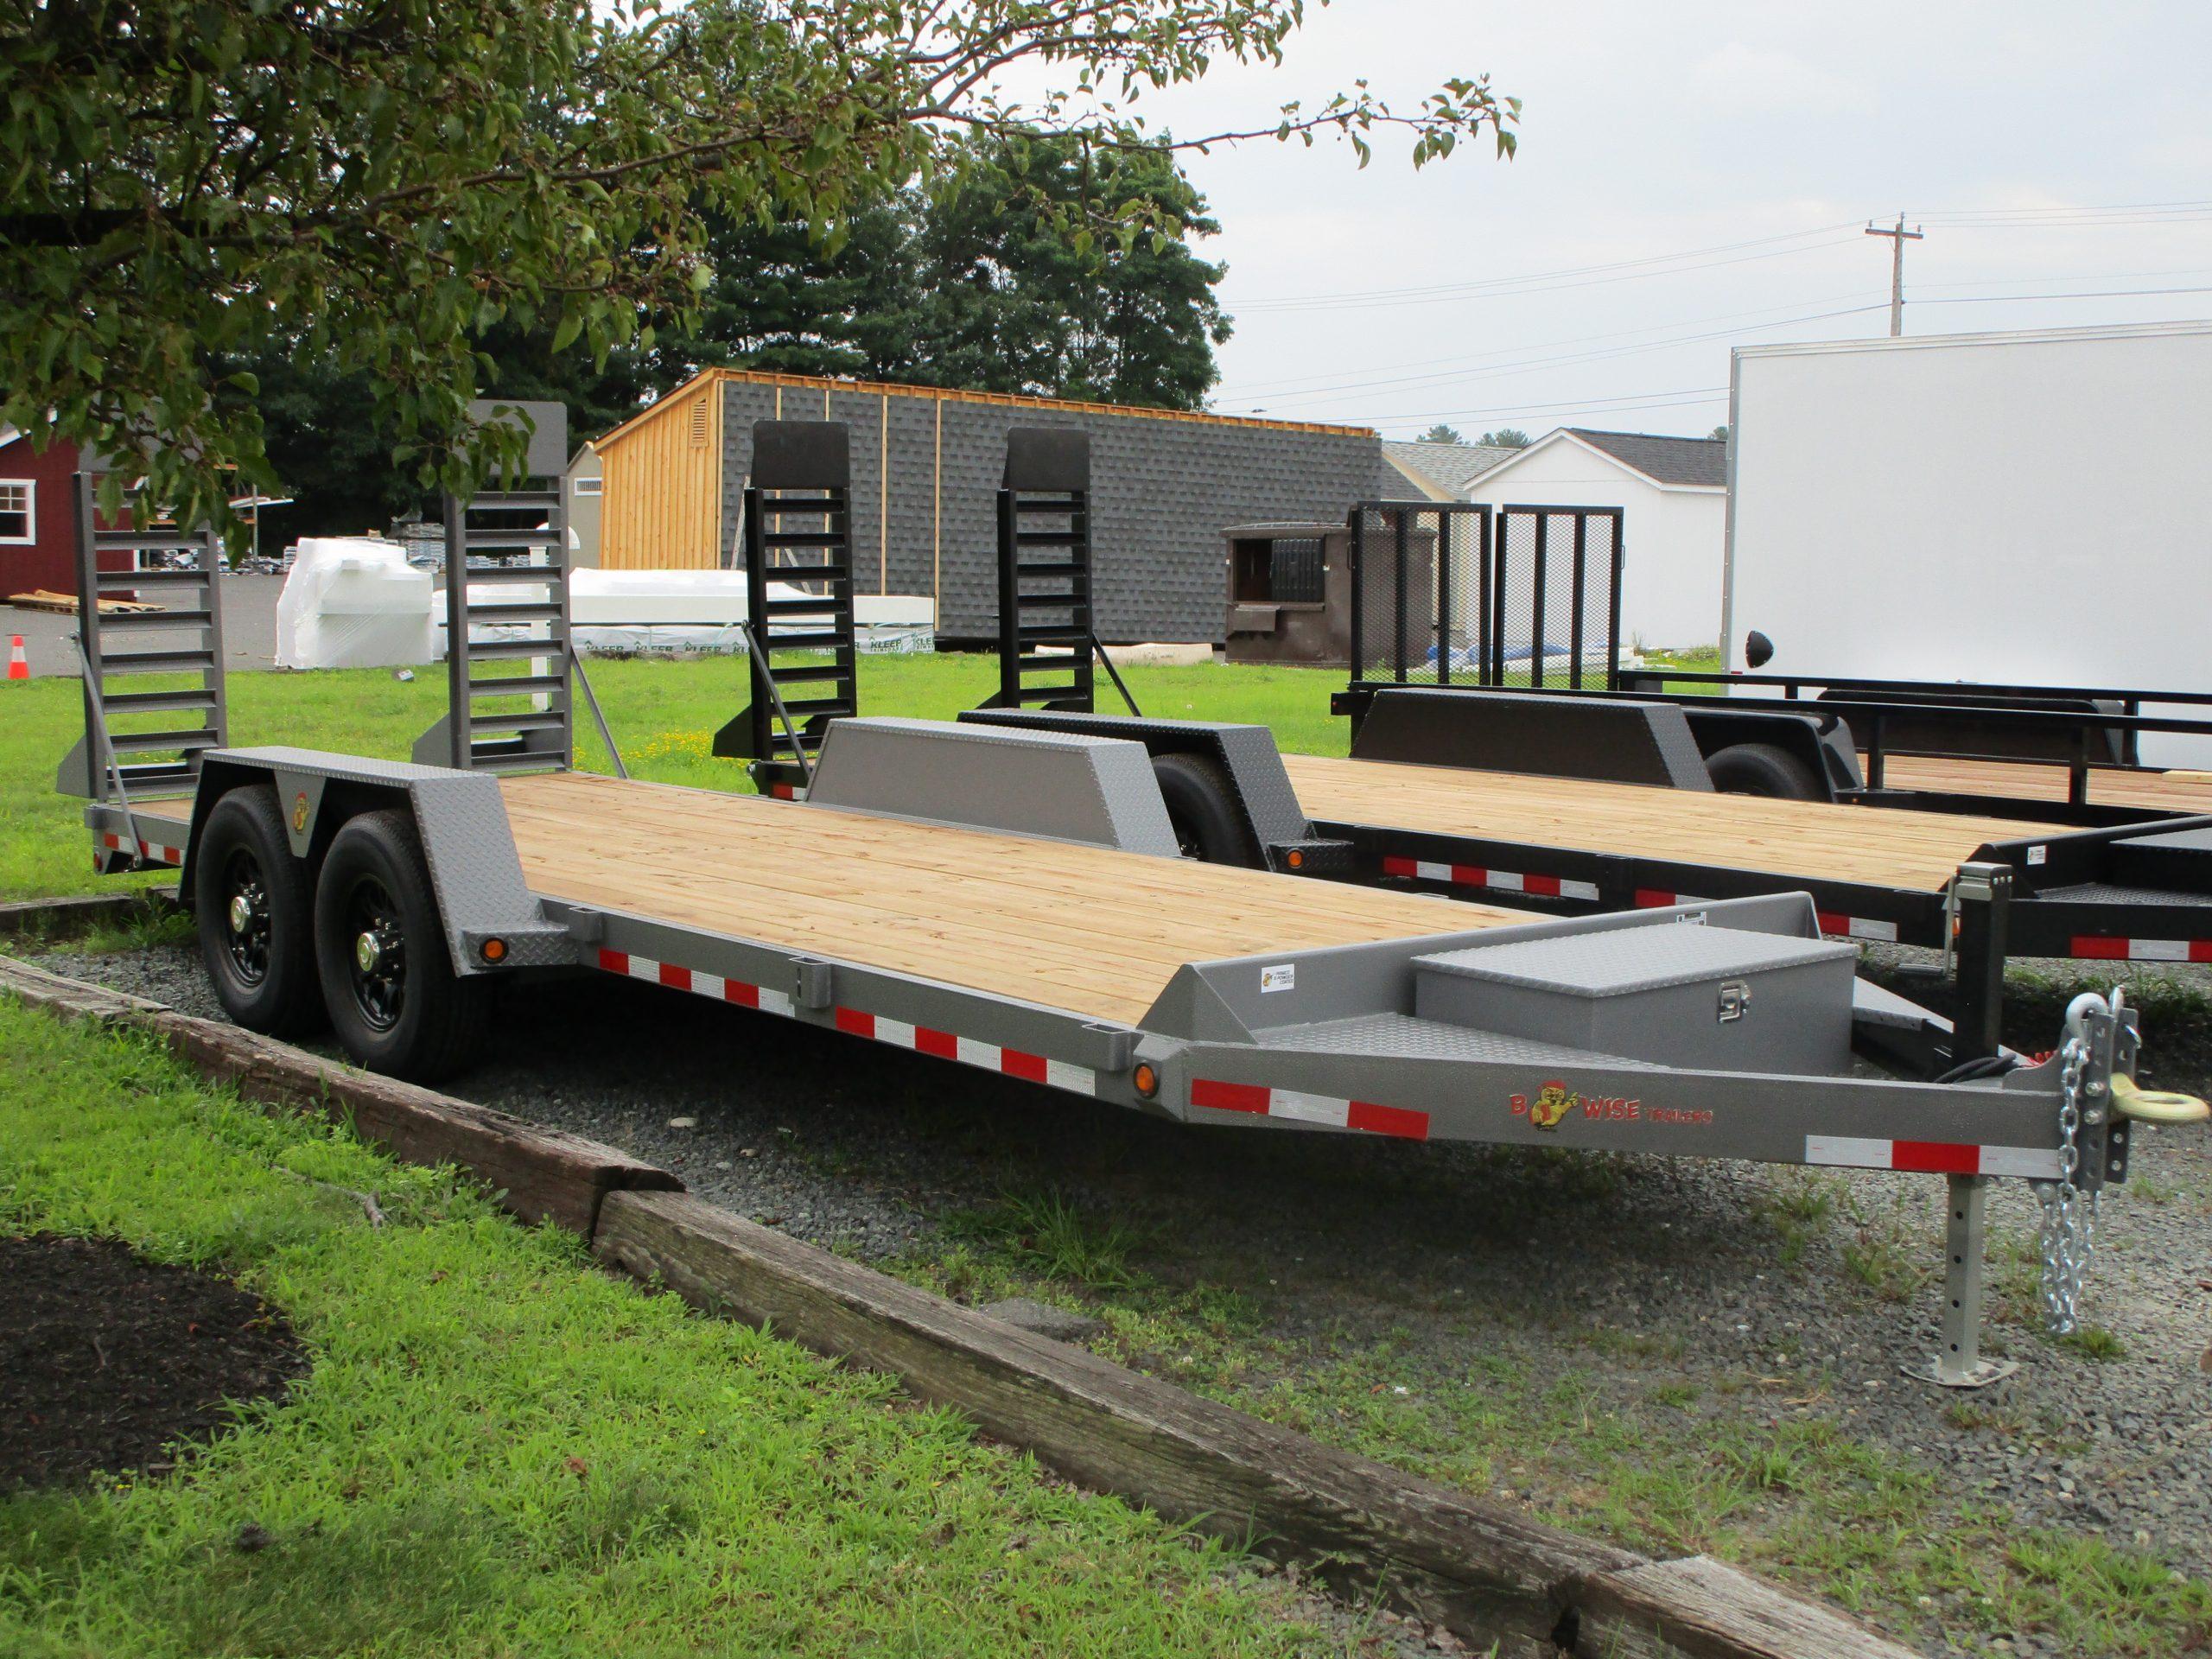 BWise EC20-15 82 x 20' - Equipment trailer 15400 GVWR